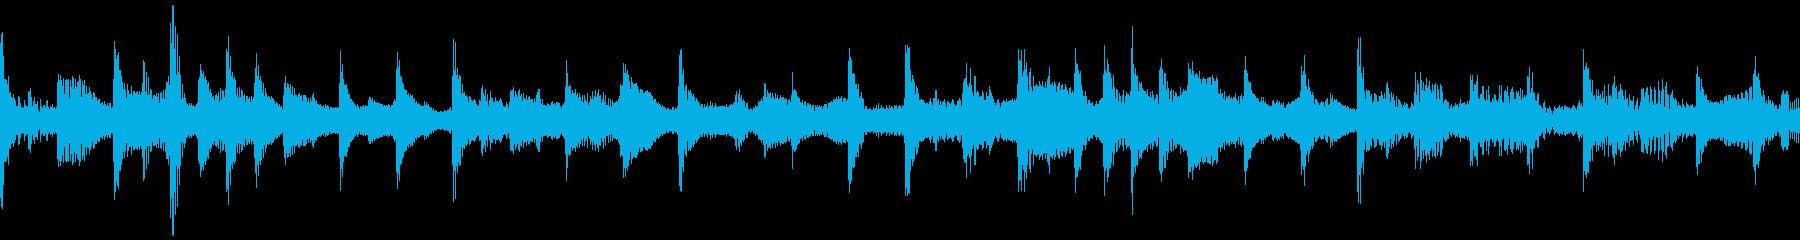 TV放送ニュース、ビジネスプレゼン...の再生済みの波形